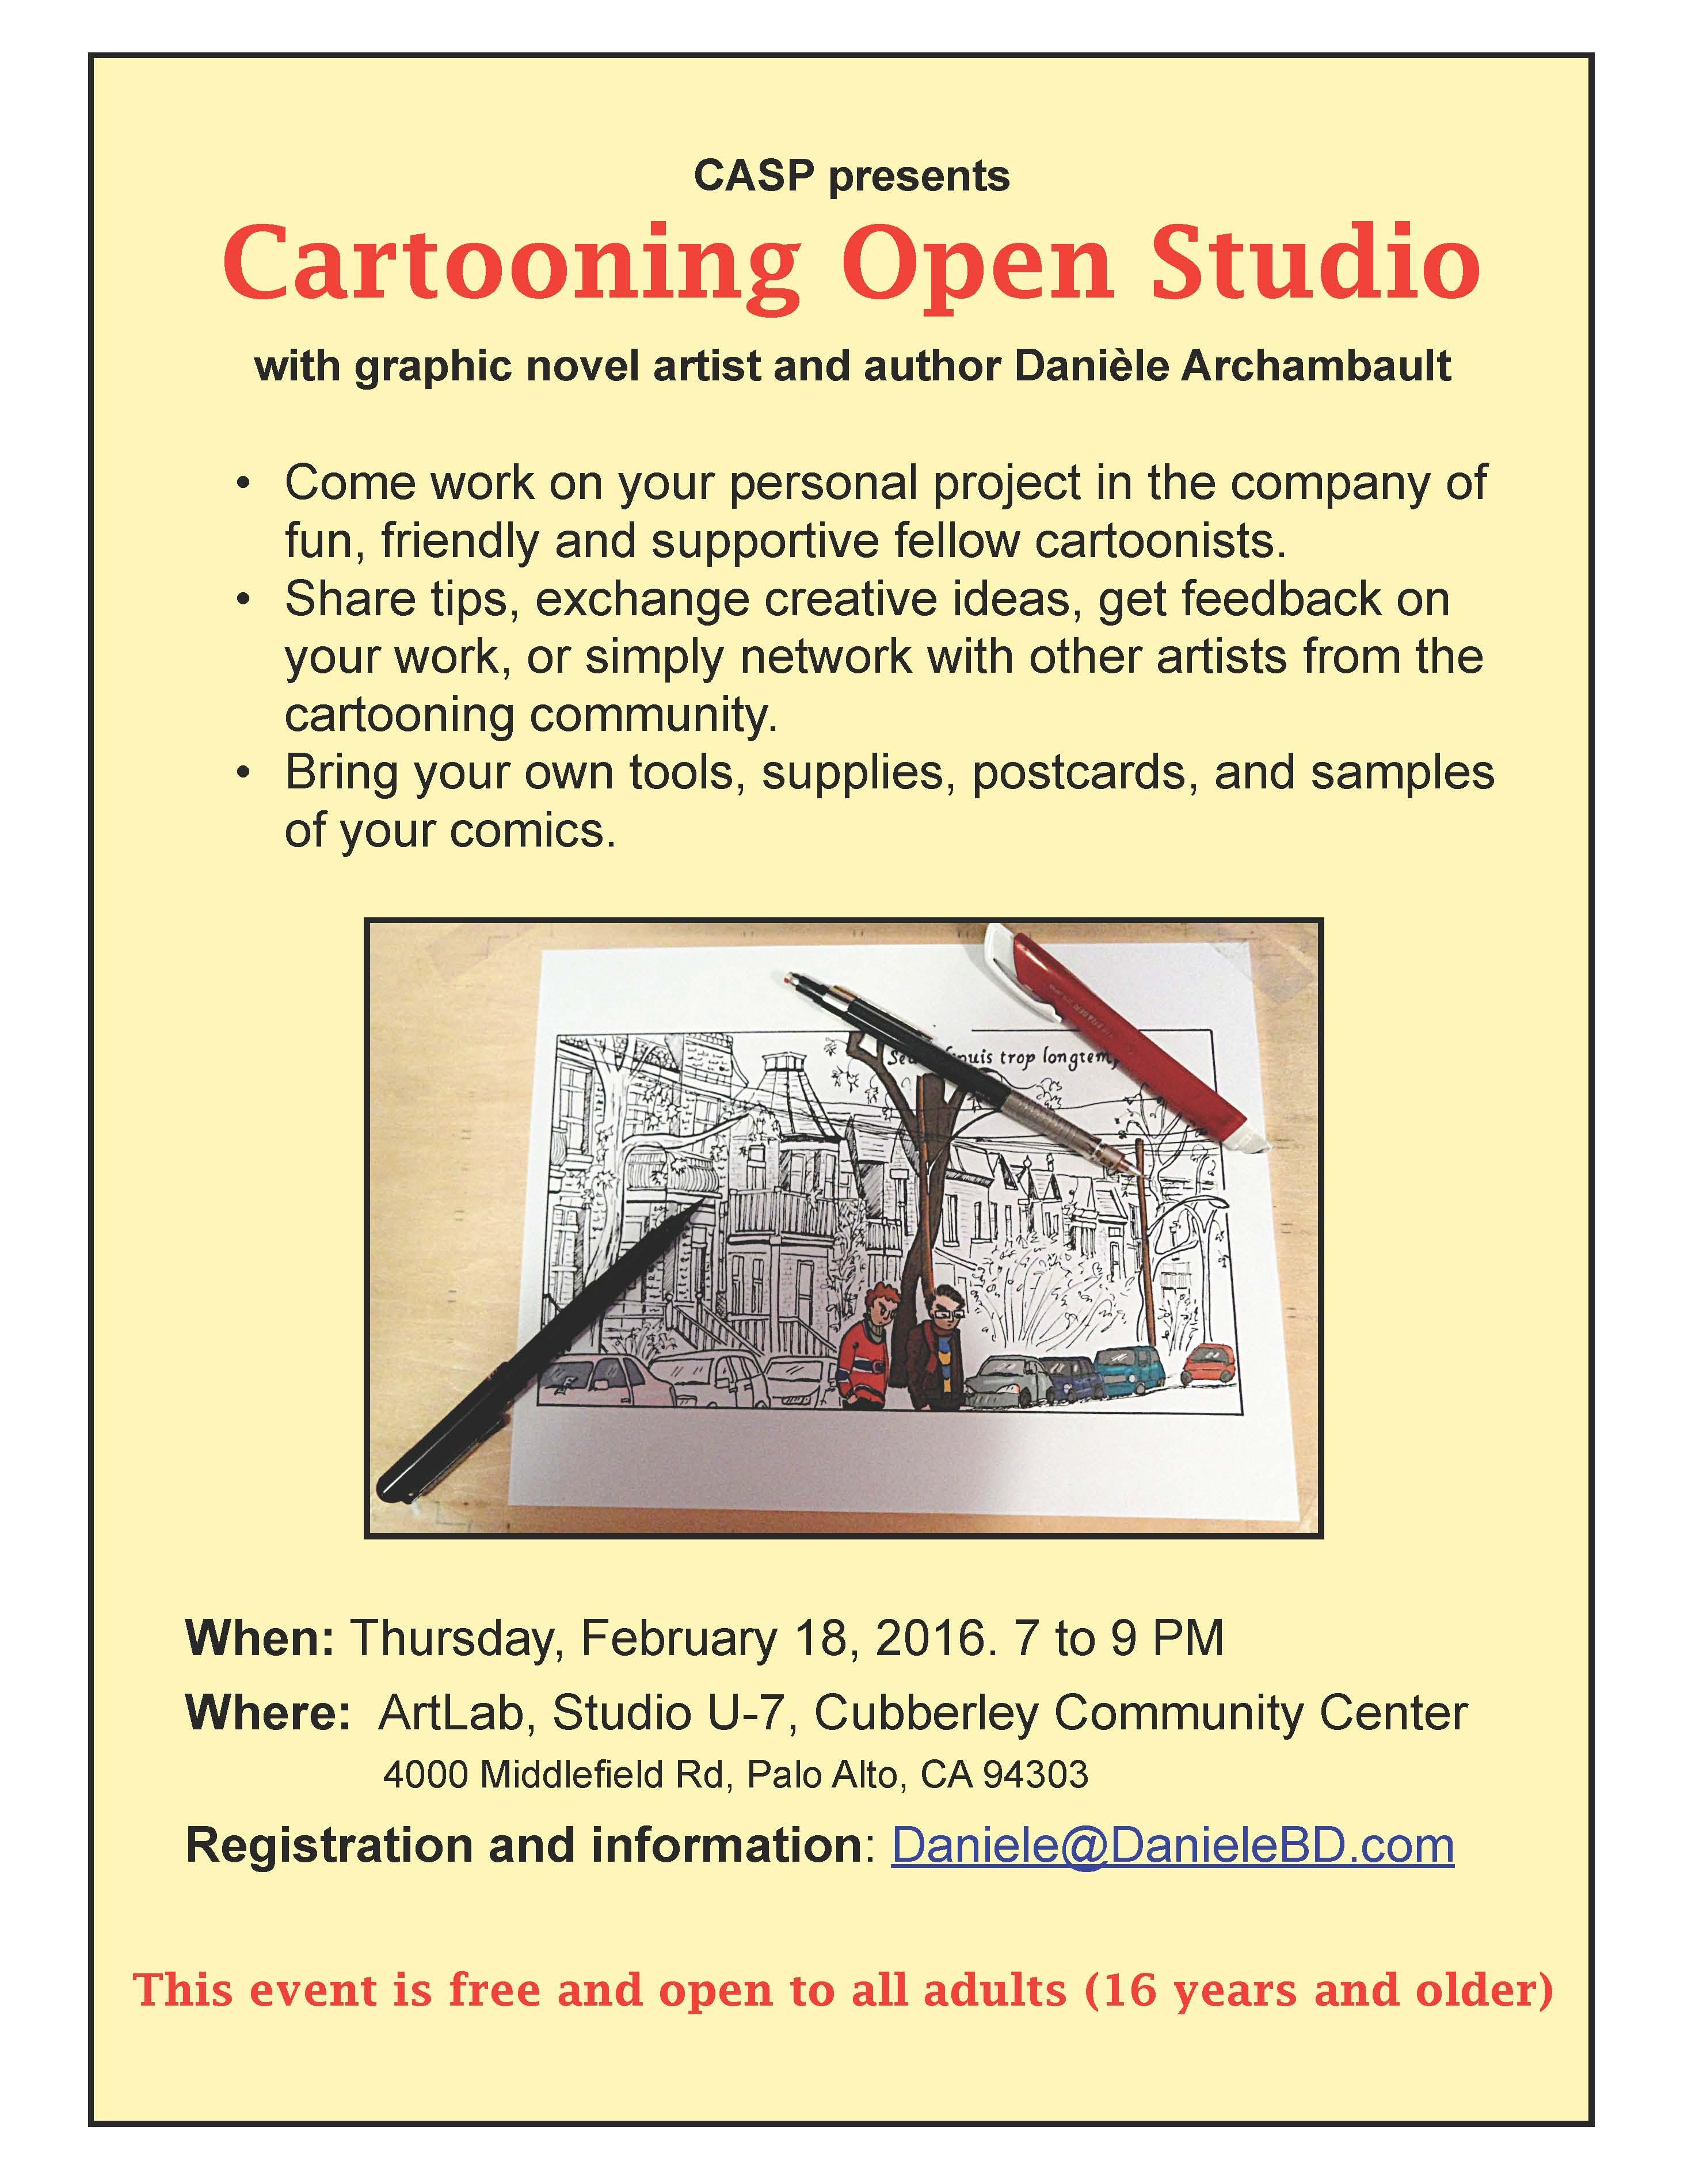 Cartooning Open Studio. Daniele Archambault